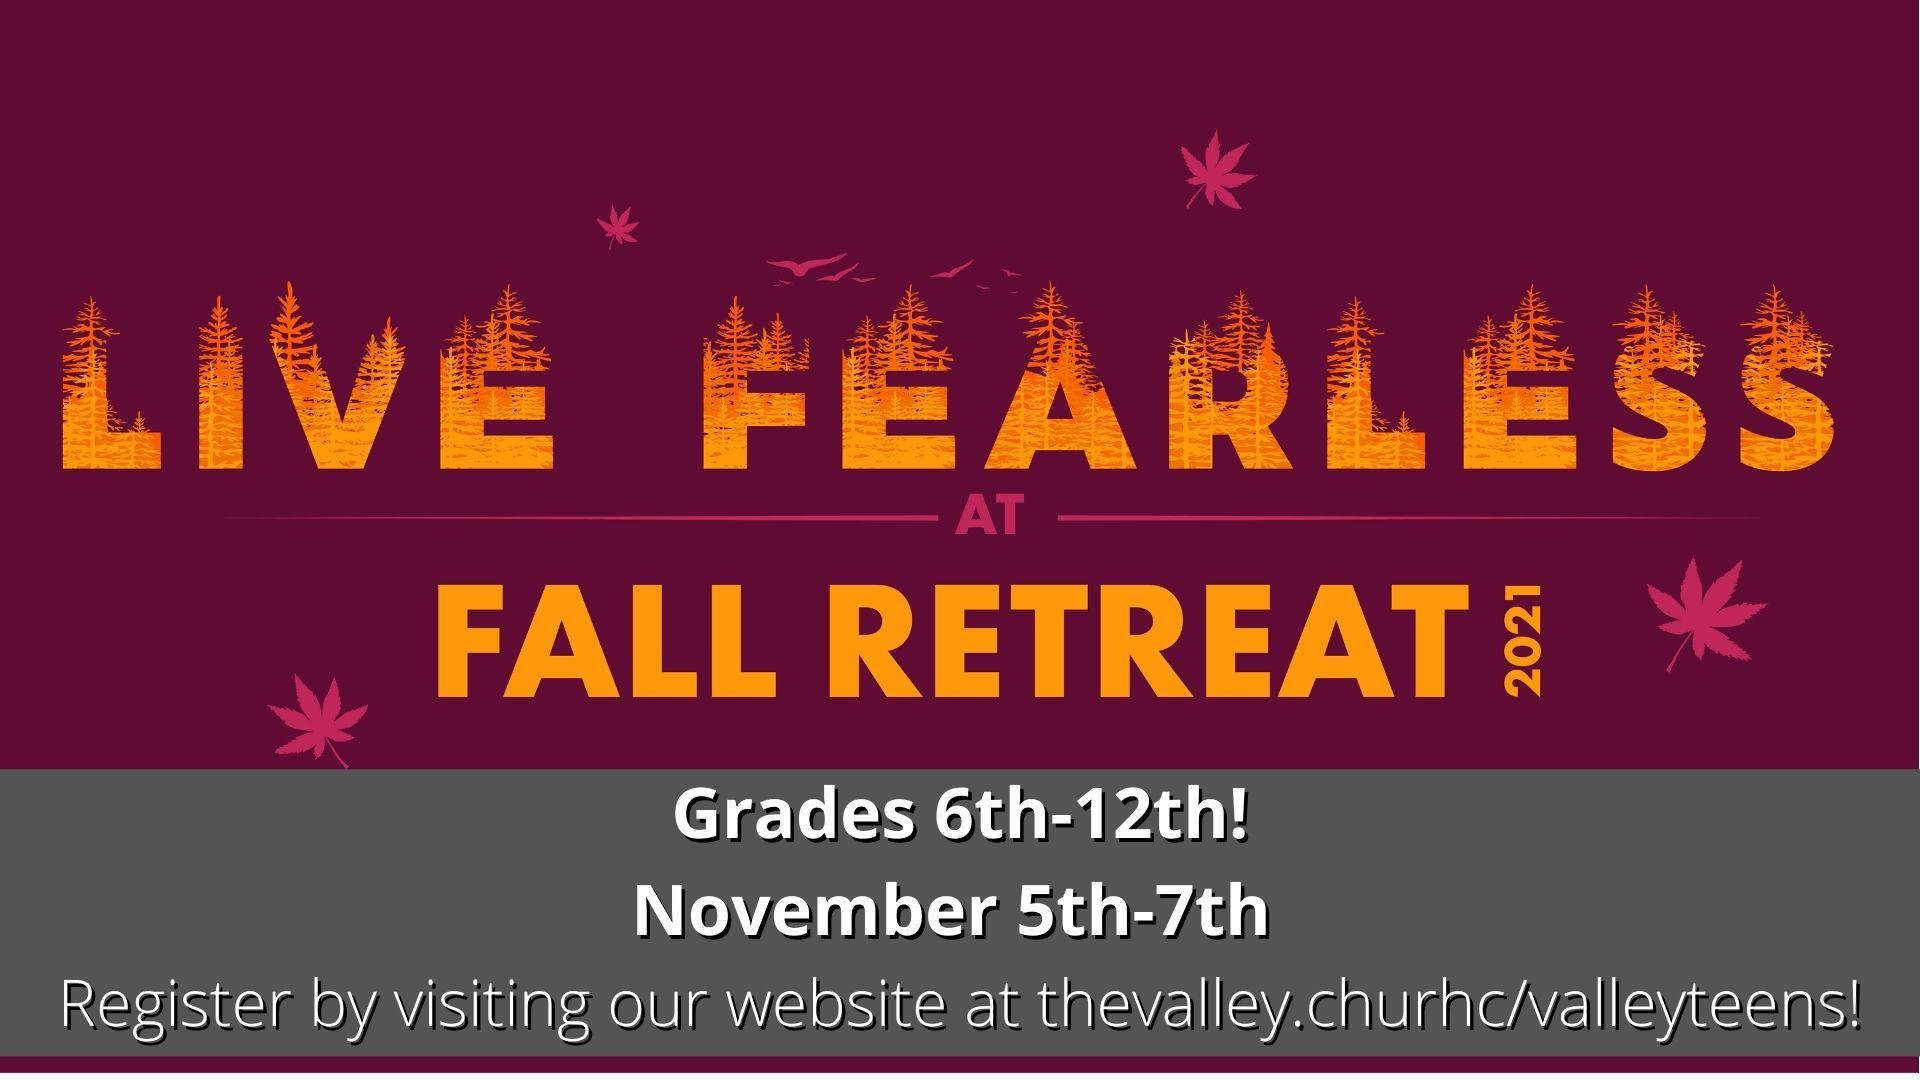 Fall Retreat 2021!